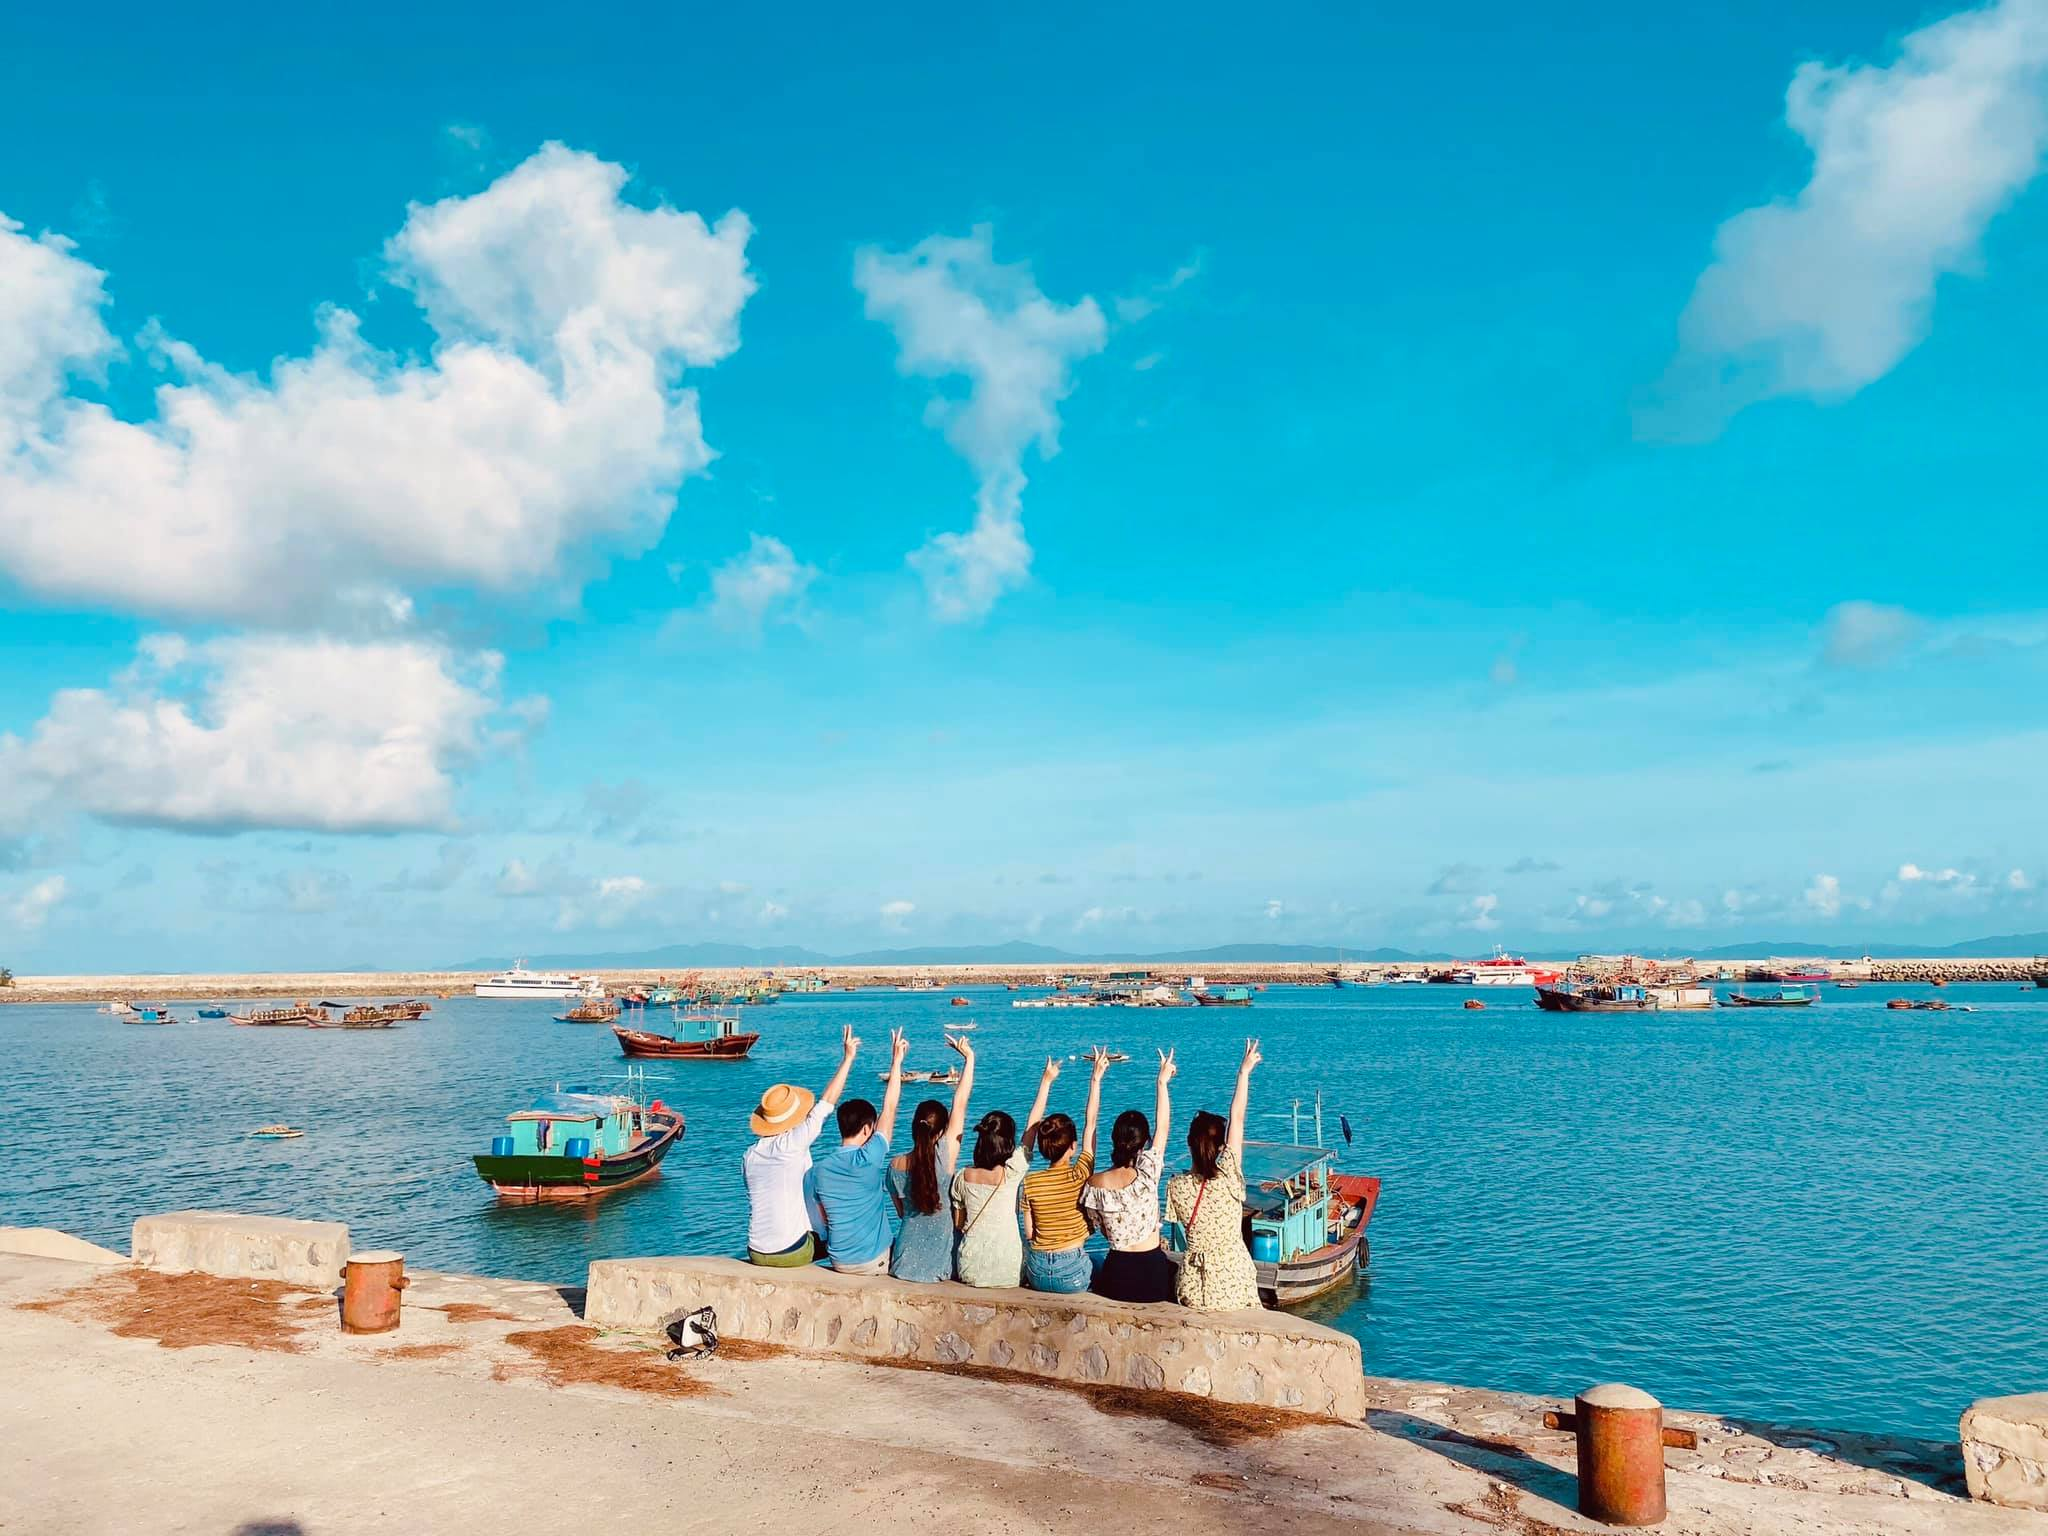 xung-xinh-checkin-nhung-bai-tam-dep-o-co-to-vietmountain-travel7